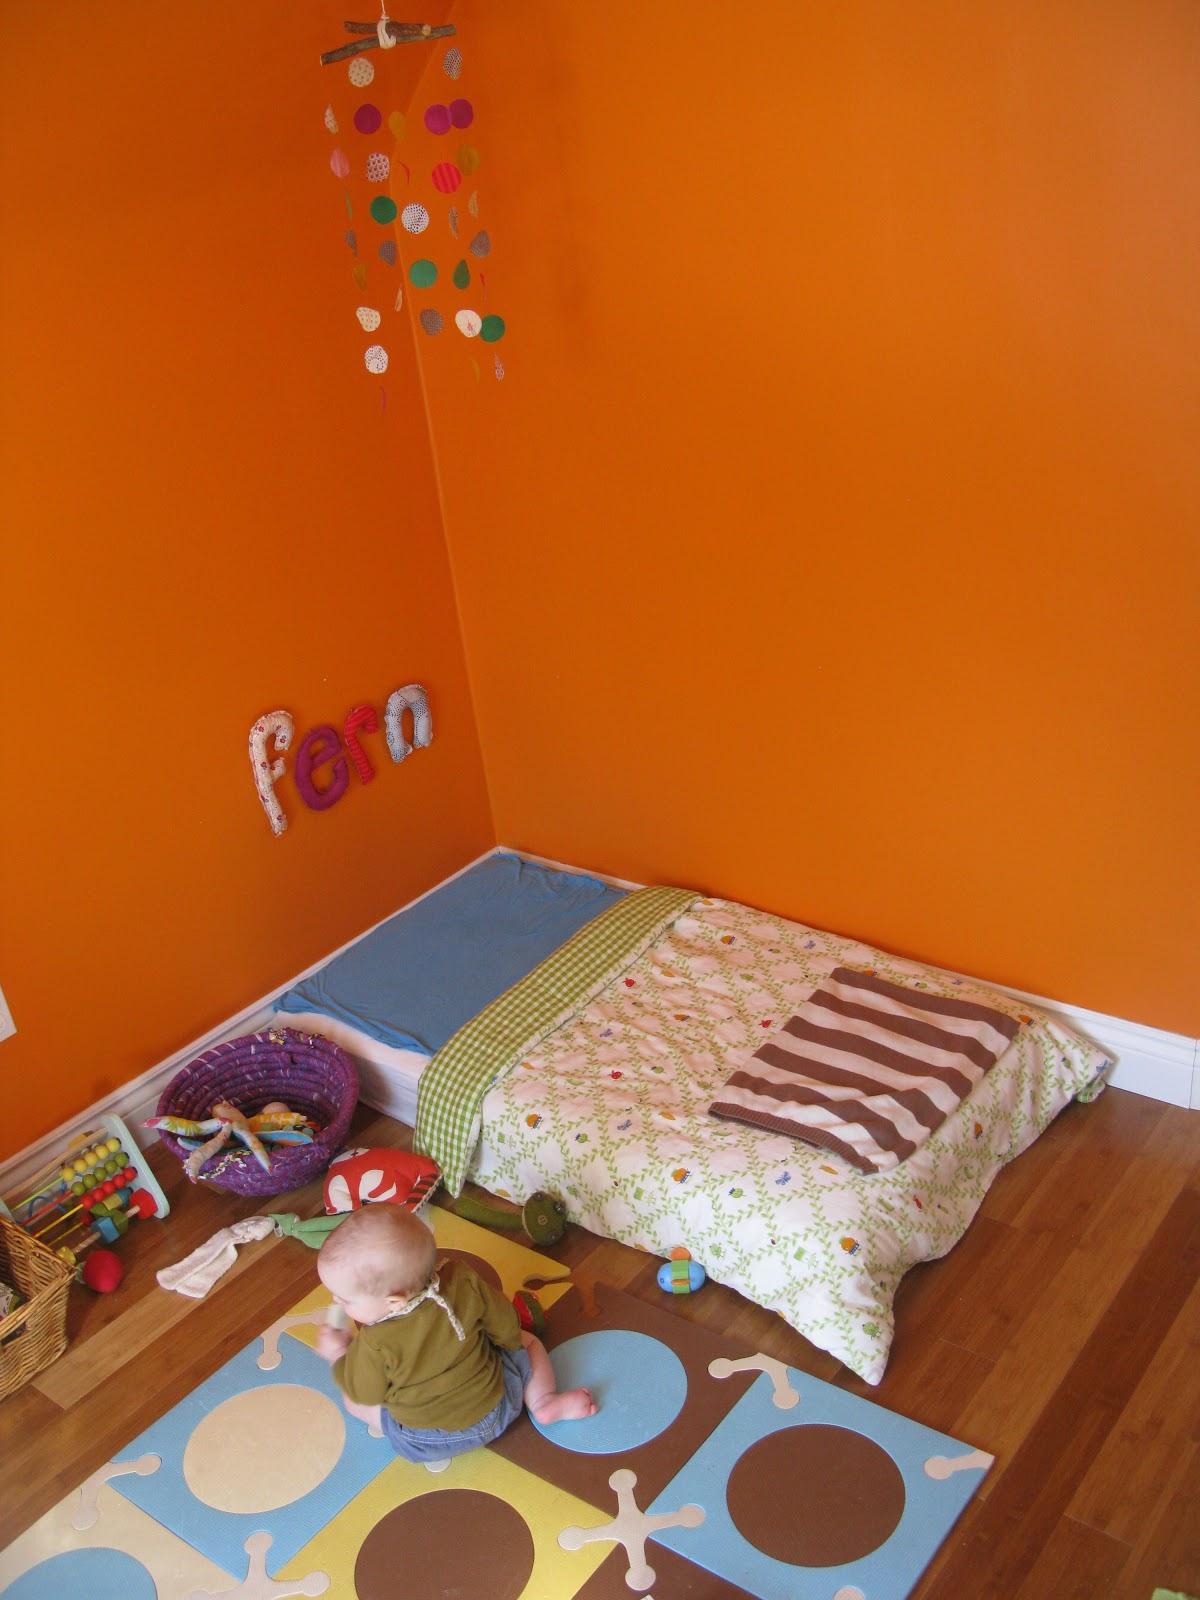 m a m a m i l i e u the montessori floor bed connecting space sleep play development. Black Bedroom Furniture Sets. Home Design Ideas